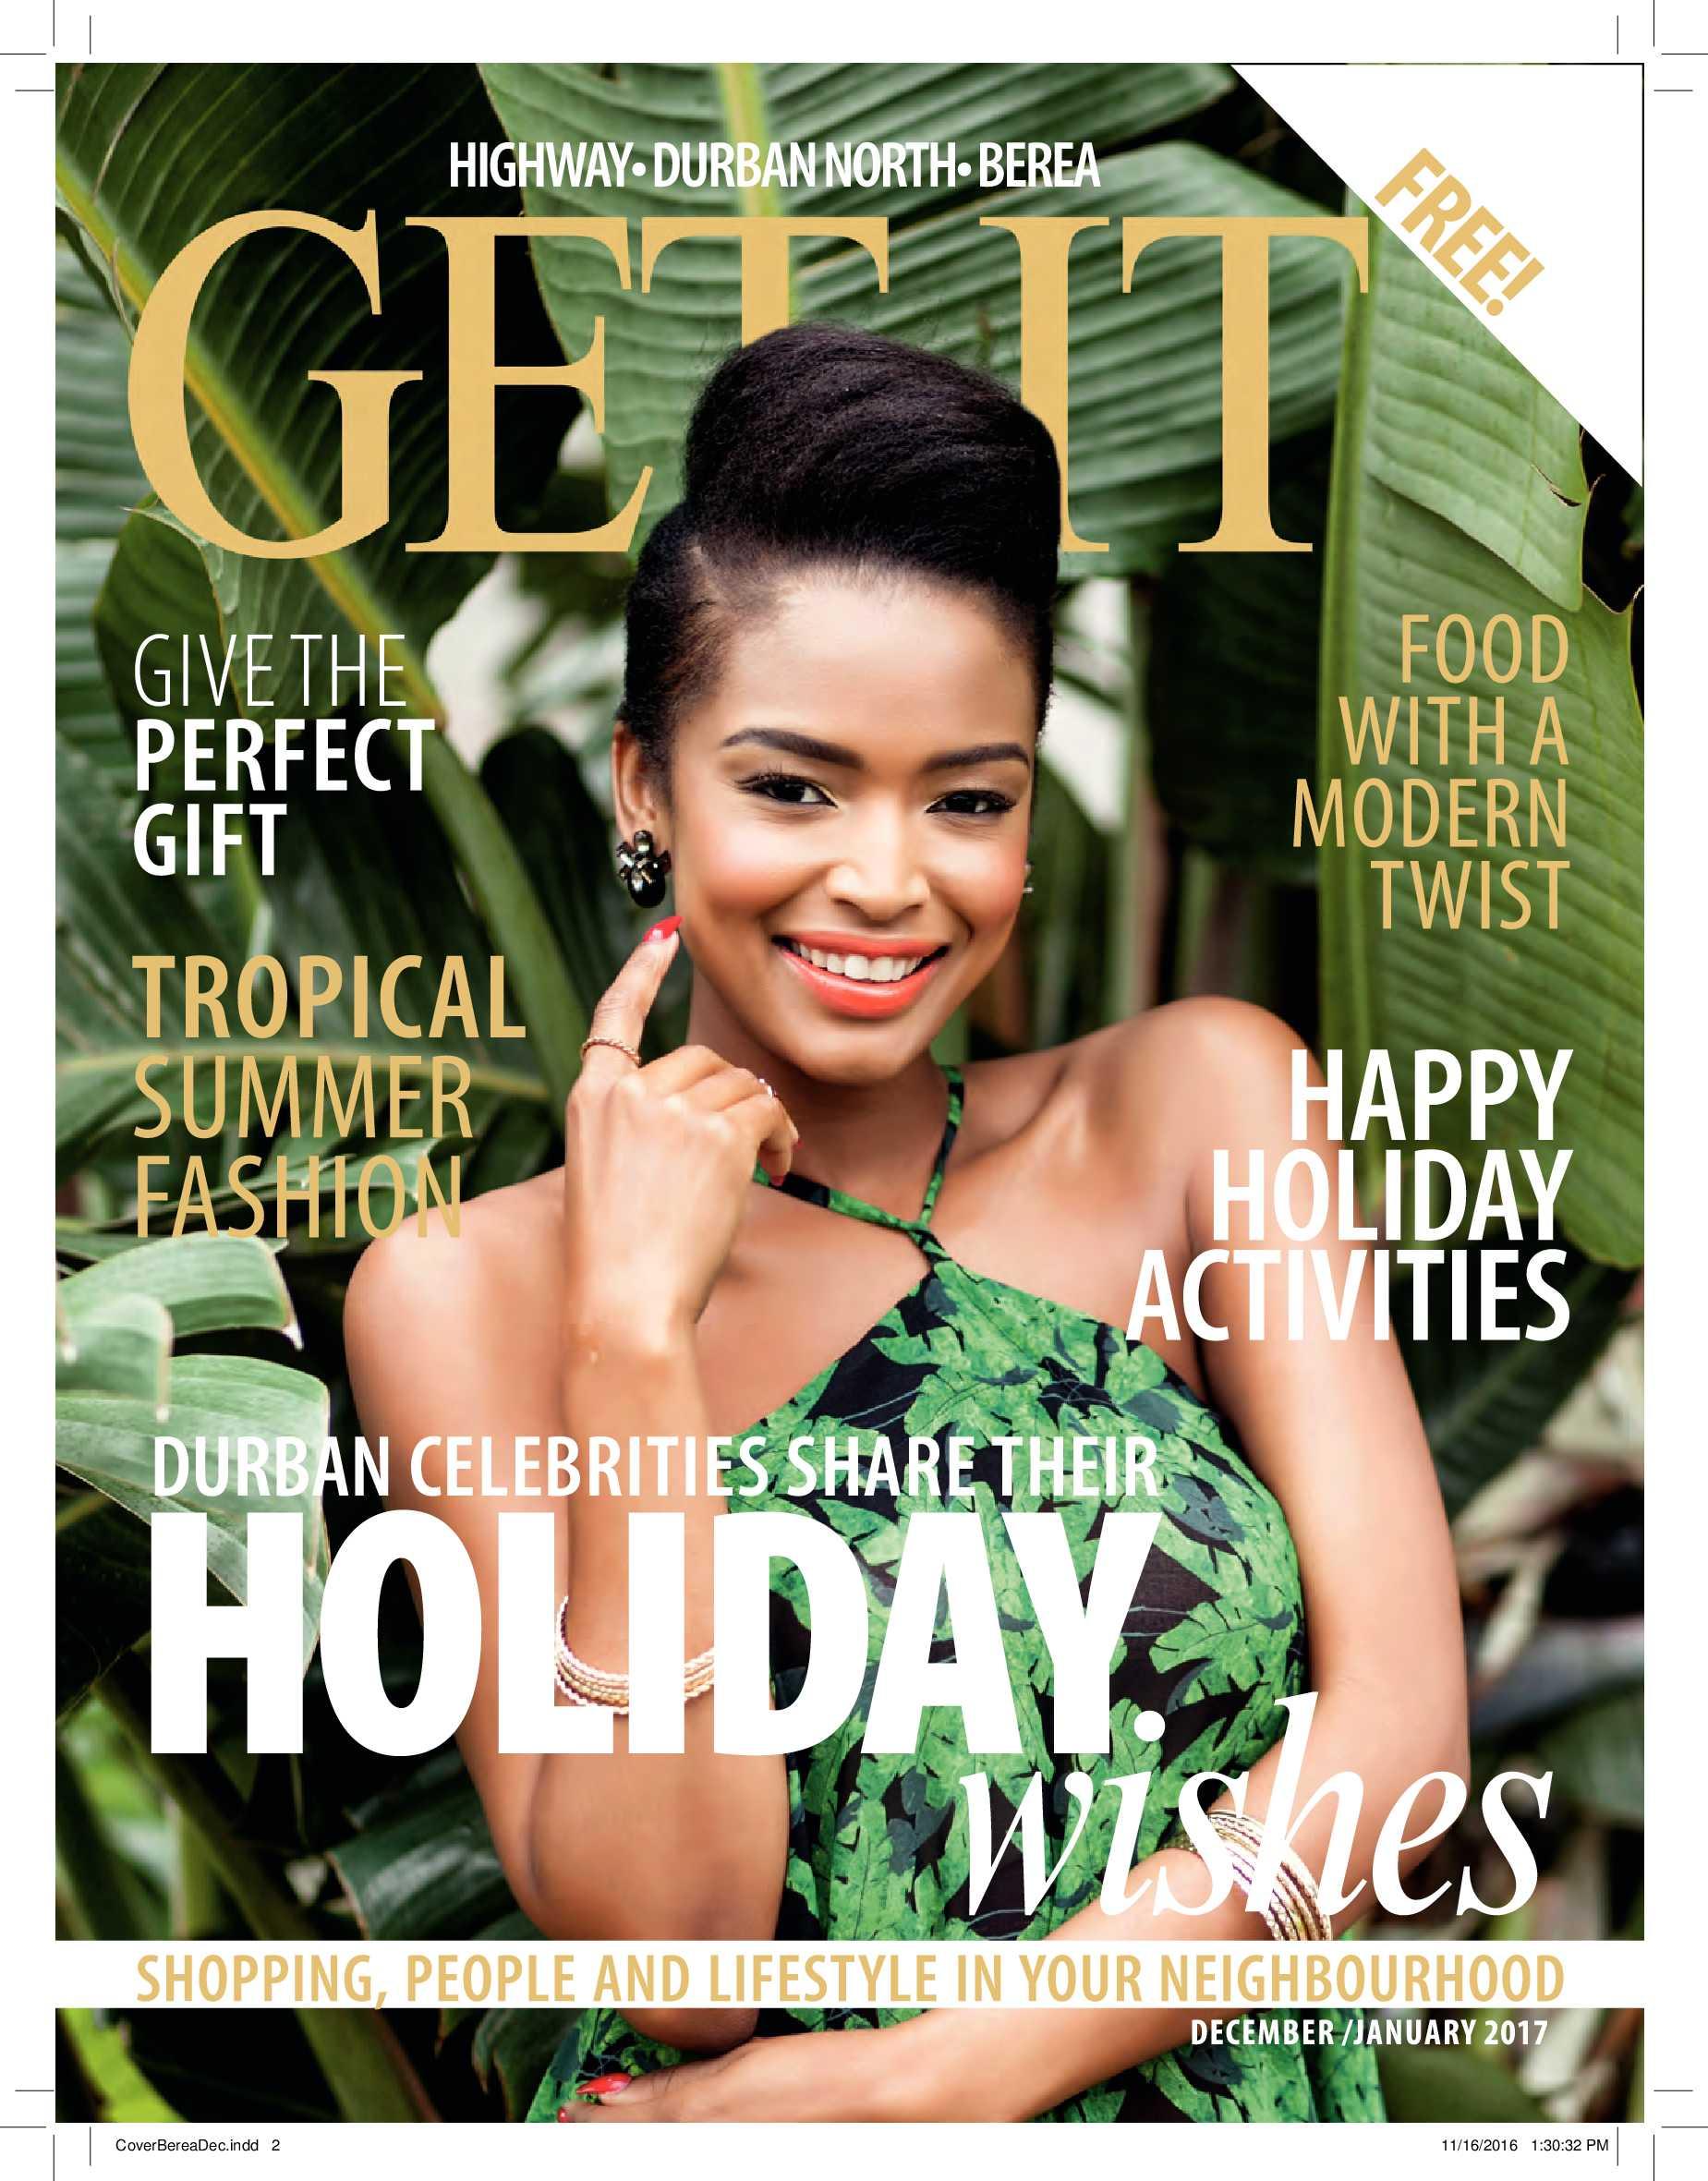 durban-get-it-magazine-december-2016-epapers-page-1